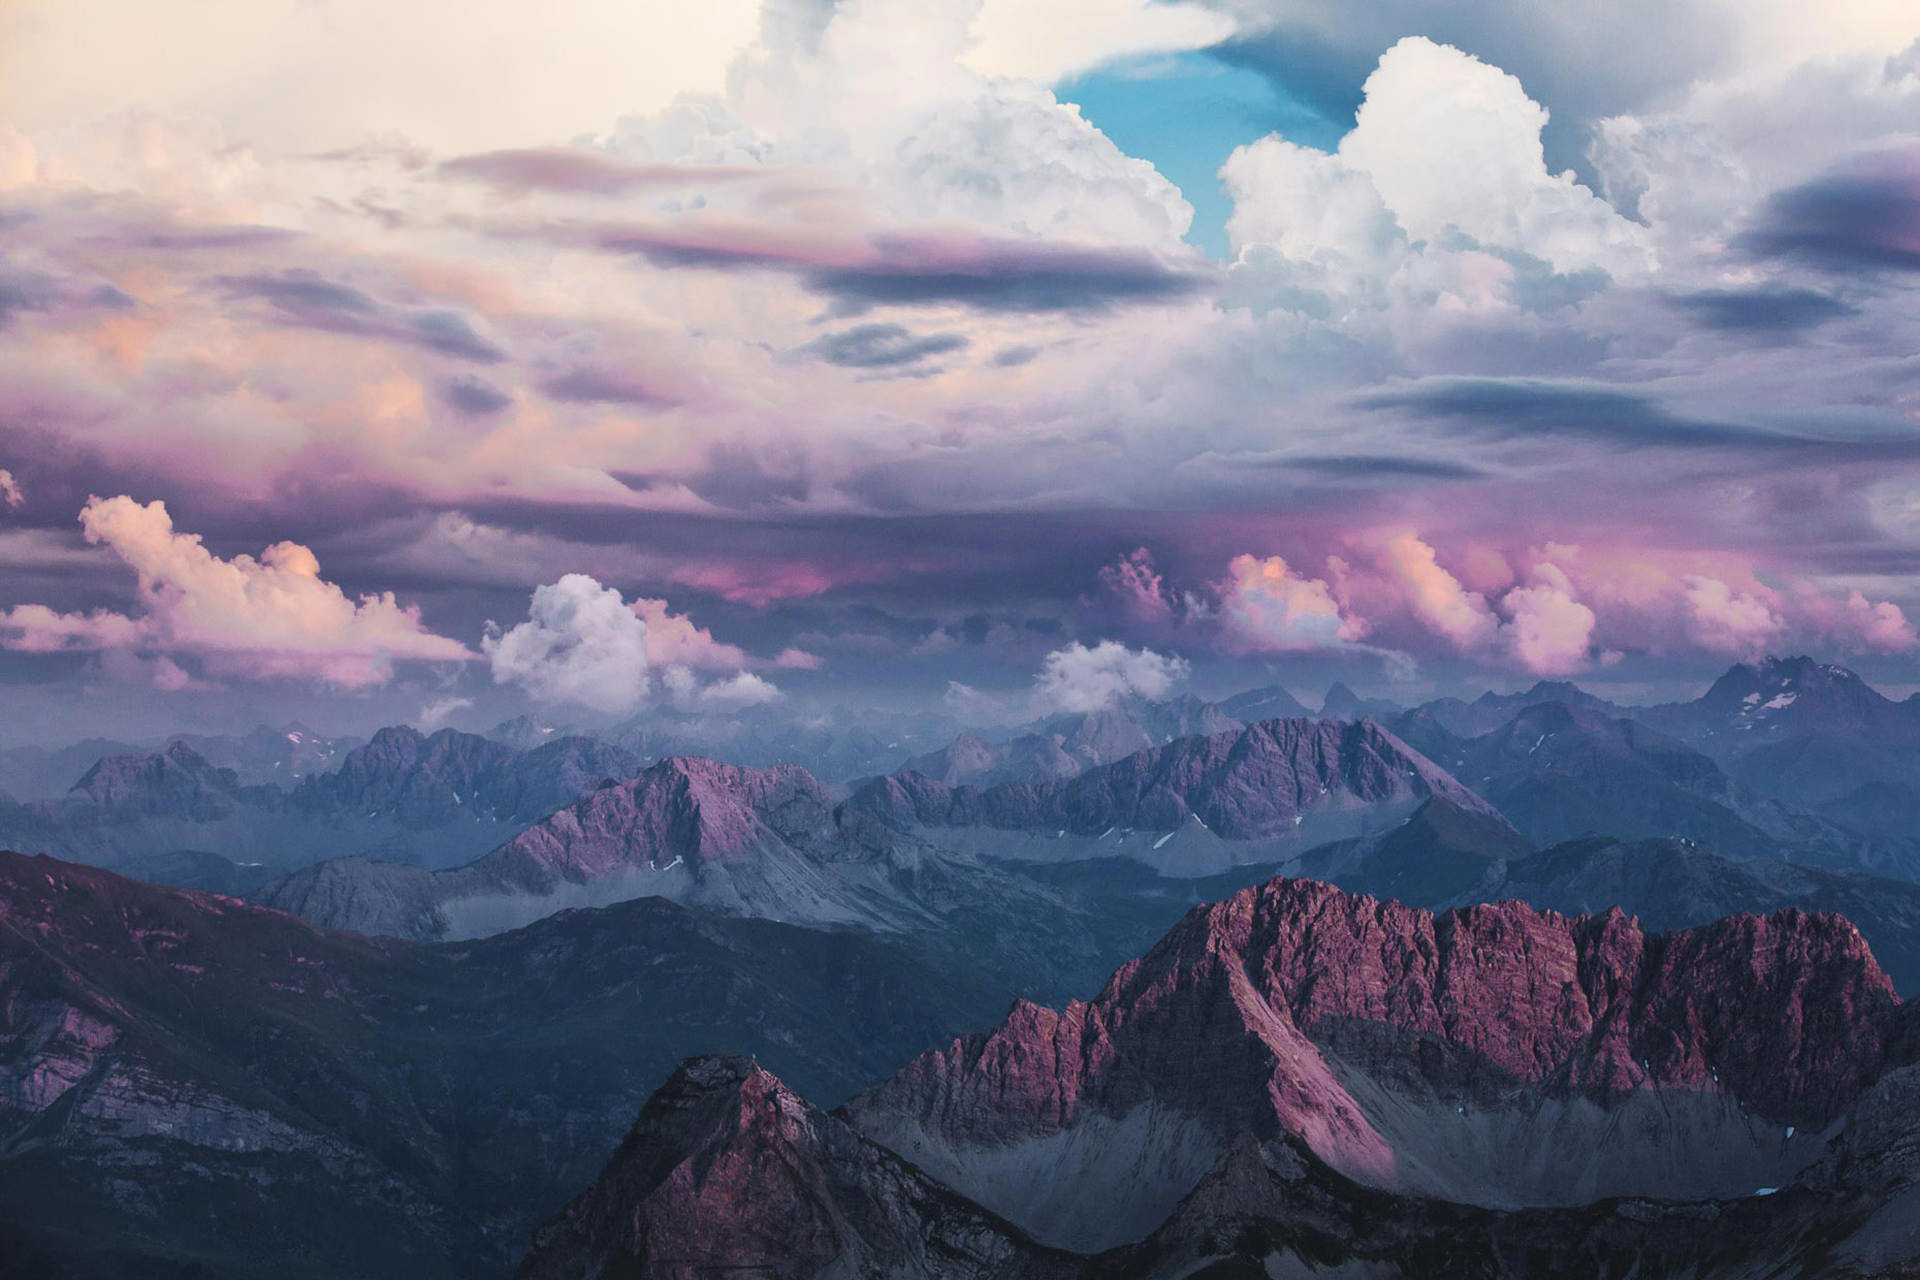 berge-gipfel-ausblick-sonnenuntergang-stimmung